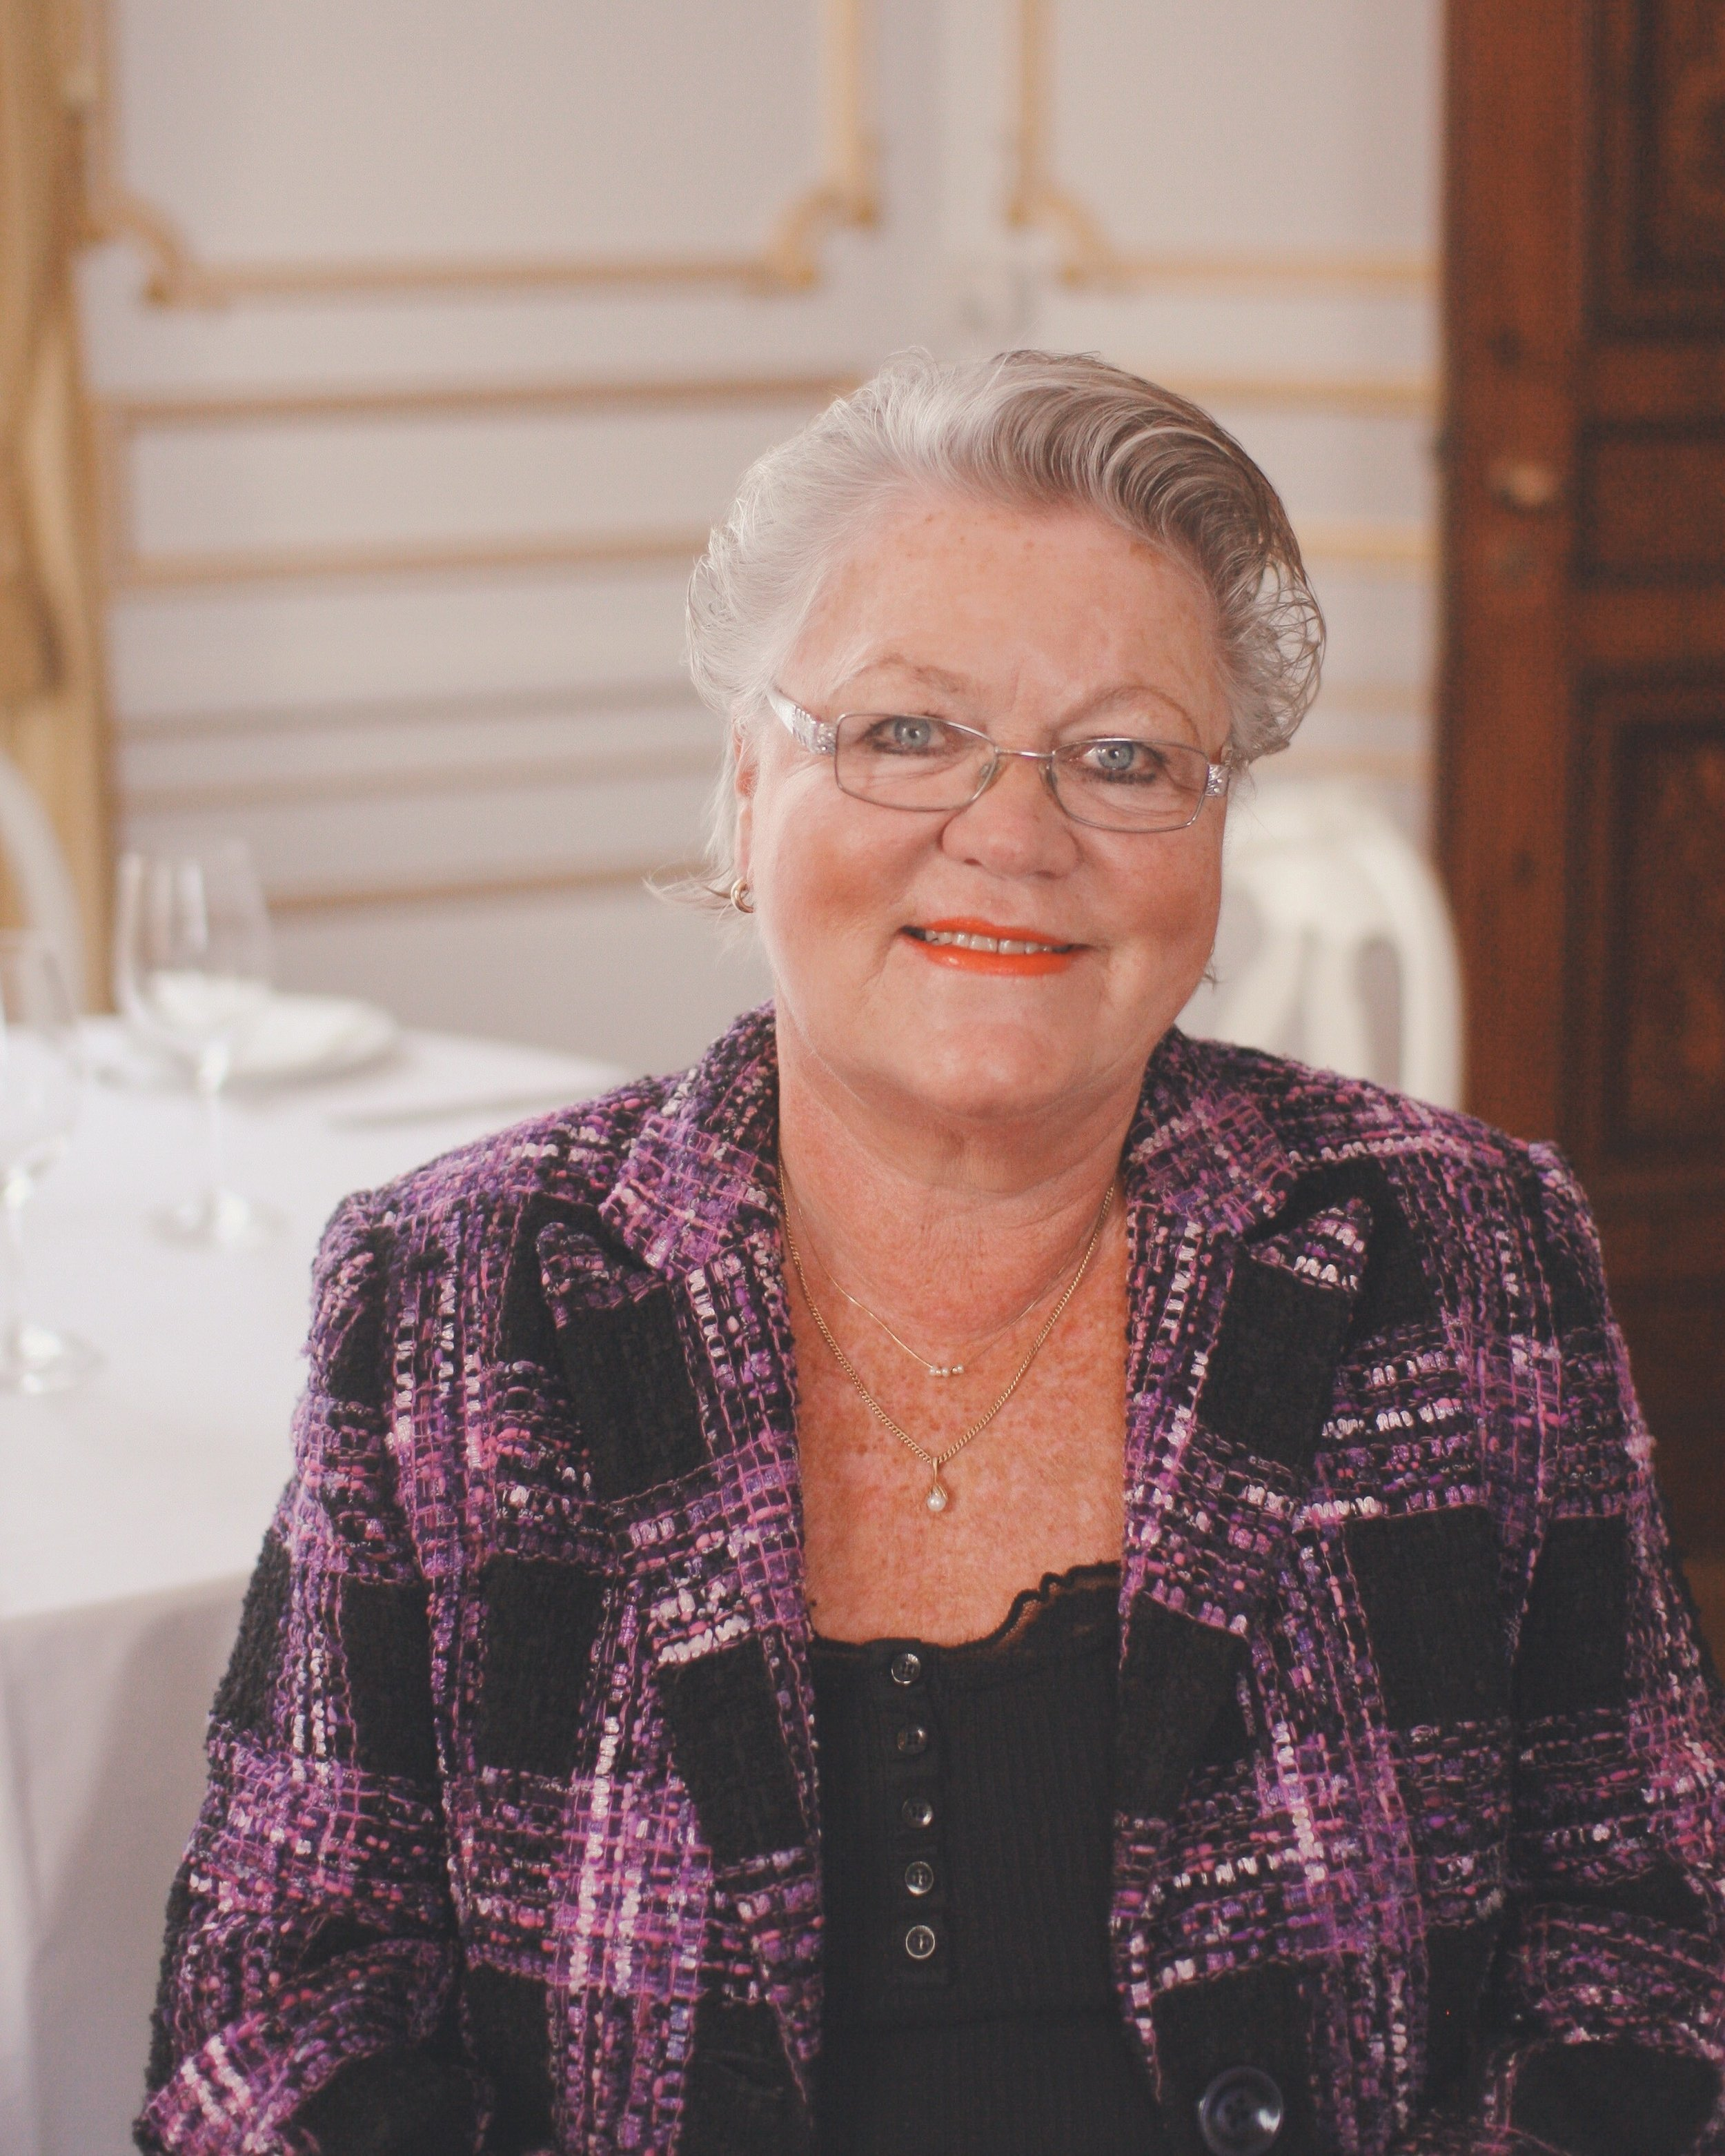 Margareta Edén Smaali  +46 76-893 93 38   margareta.eden-smaali@gaialeadership.com